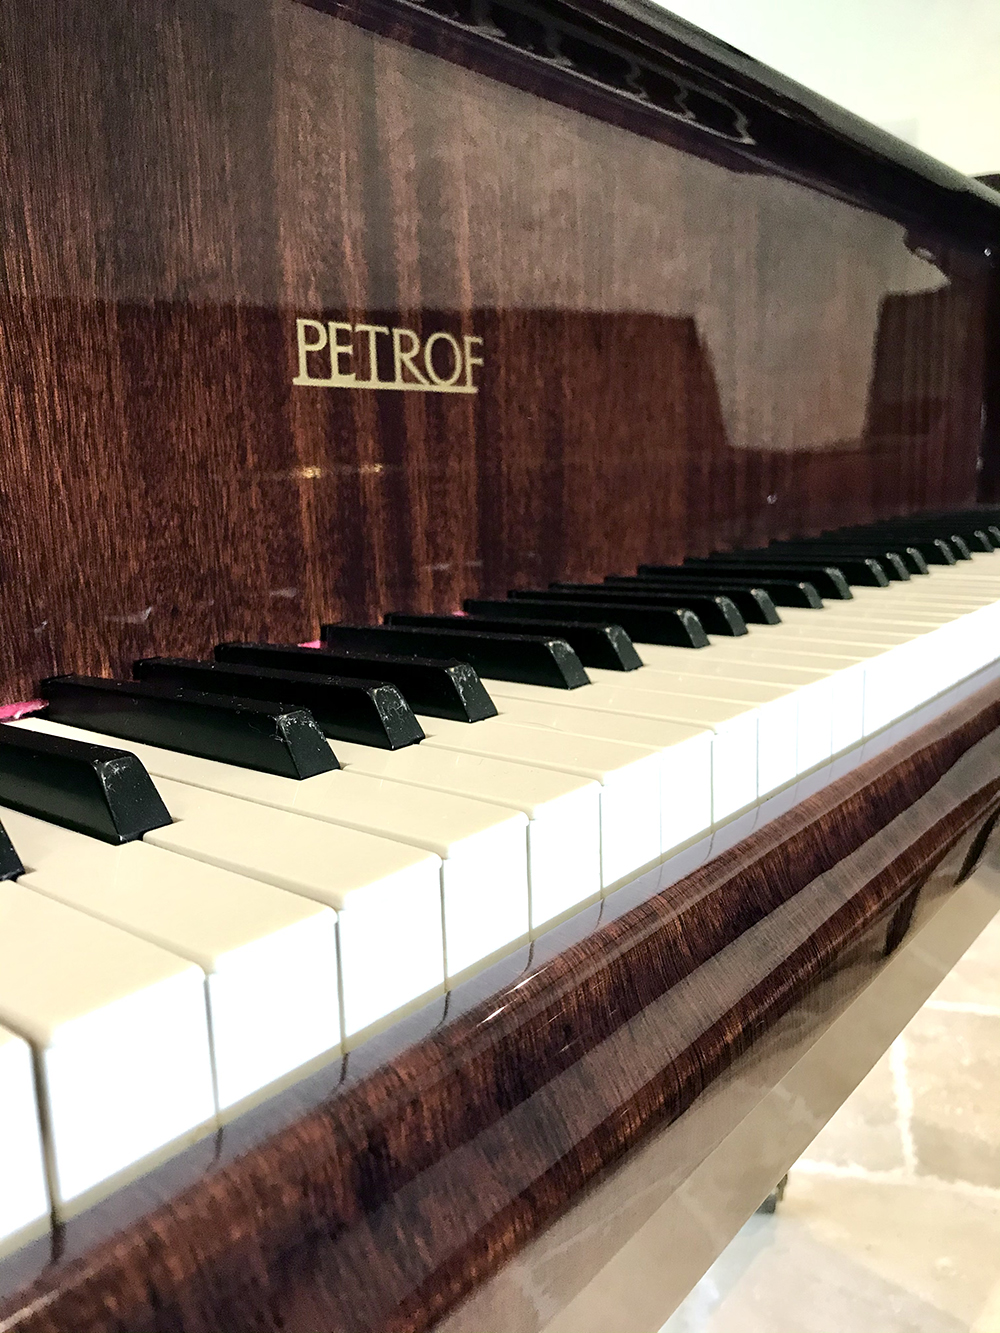 used-petrof-baby-grand-Piano-Dorset-for-sale-9.jpg